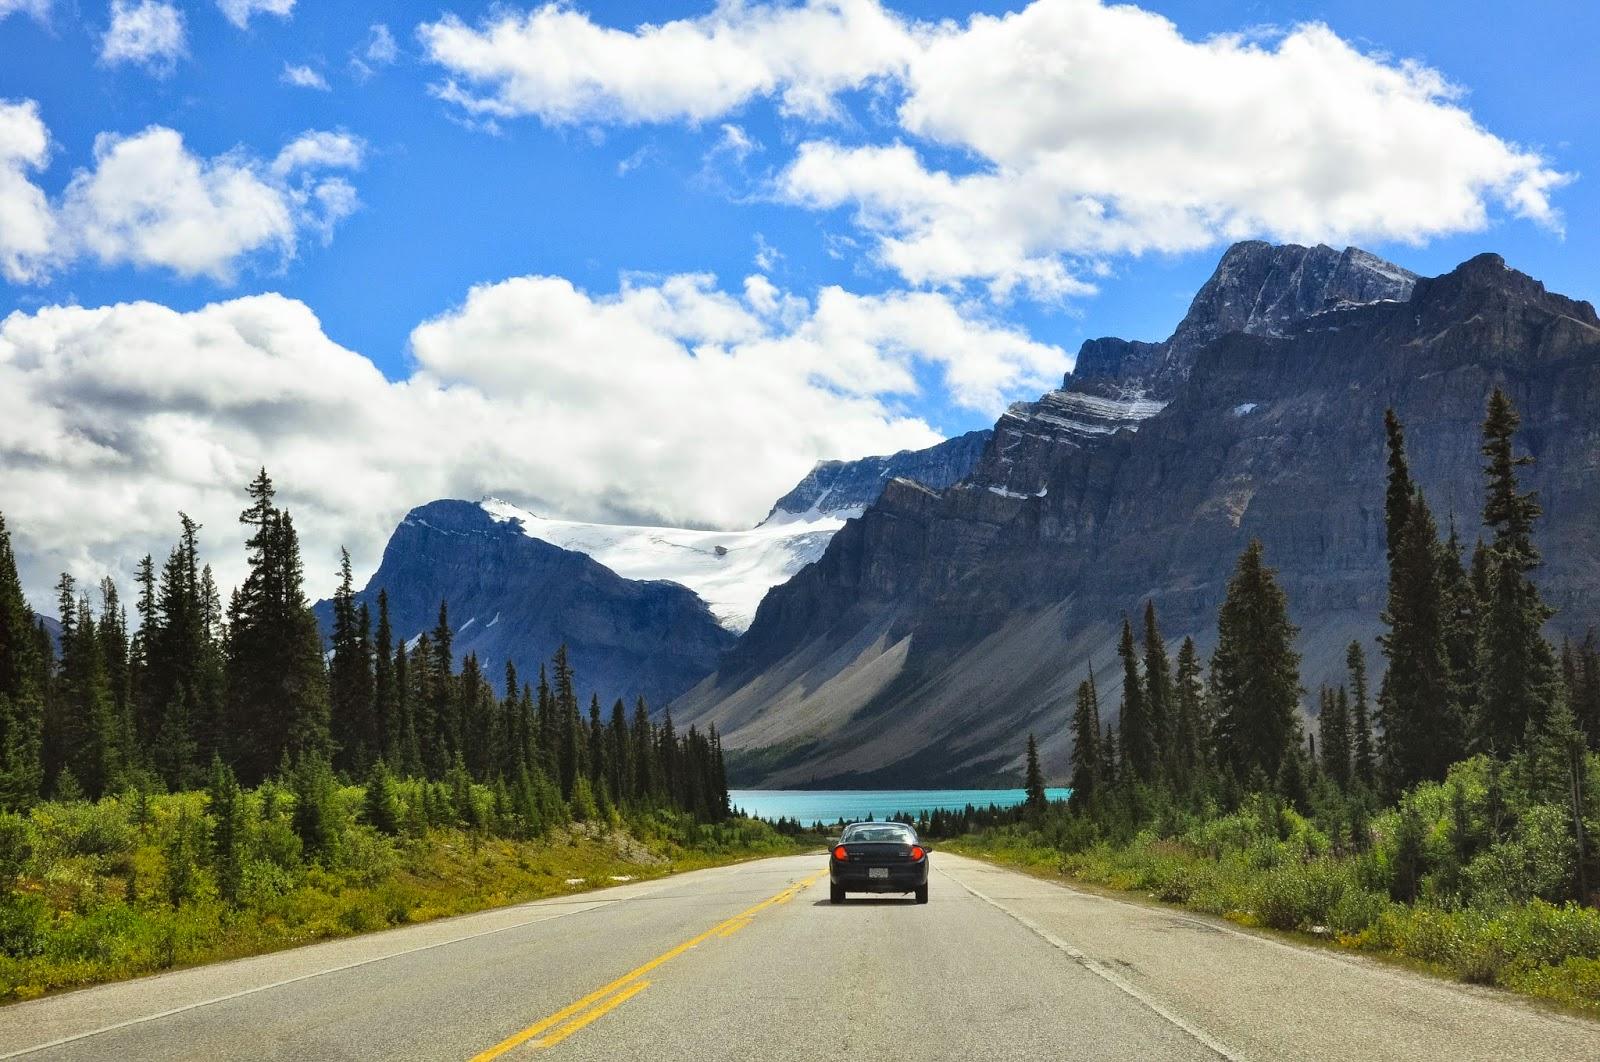 canada, alberta, canadian rockies, road trip